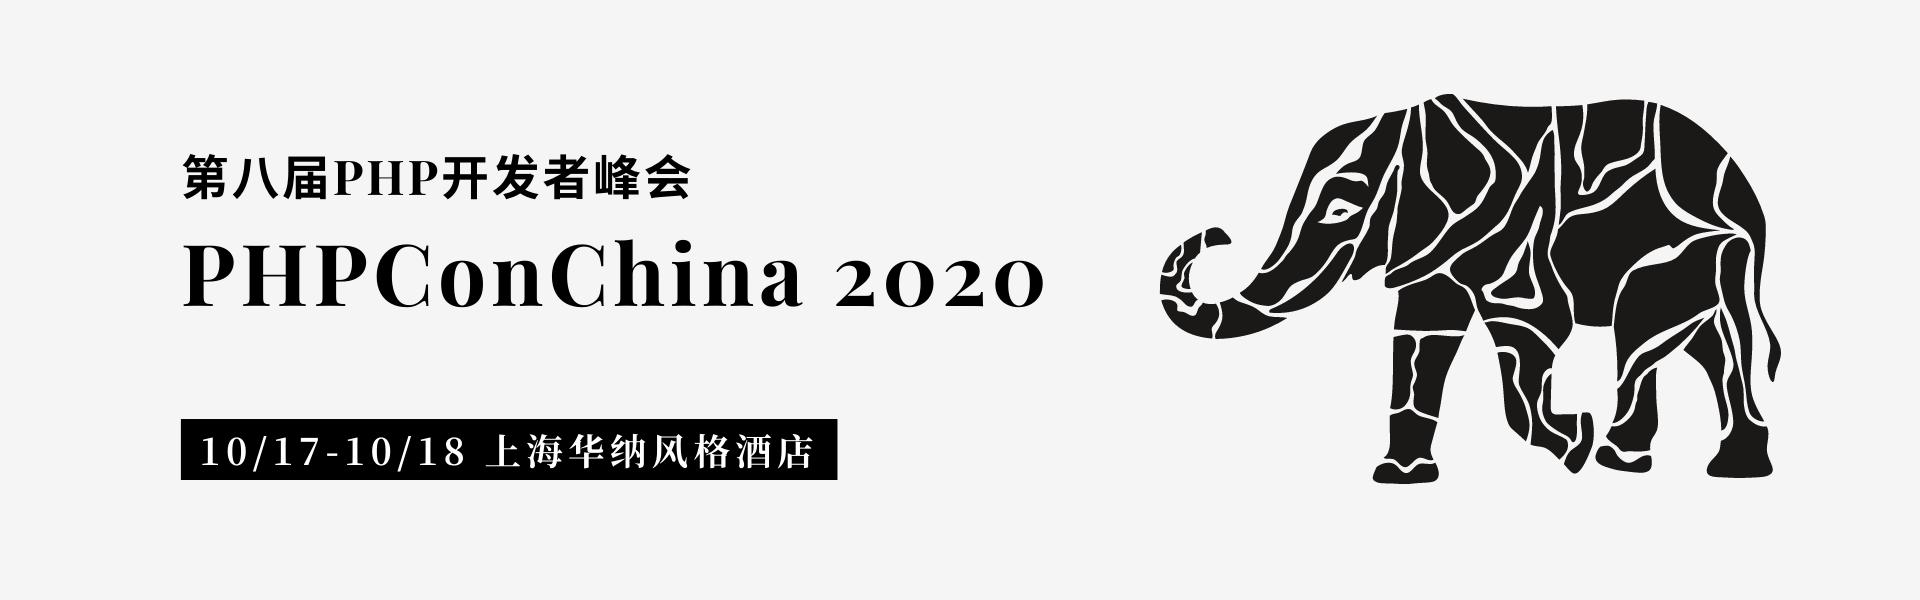 第八届PHP开发者峰会PHPConChina 2020